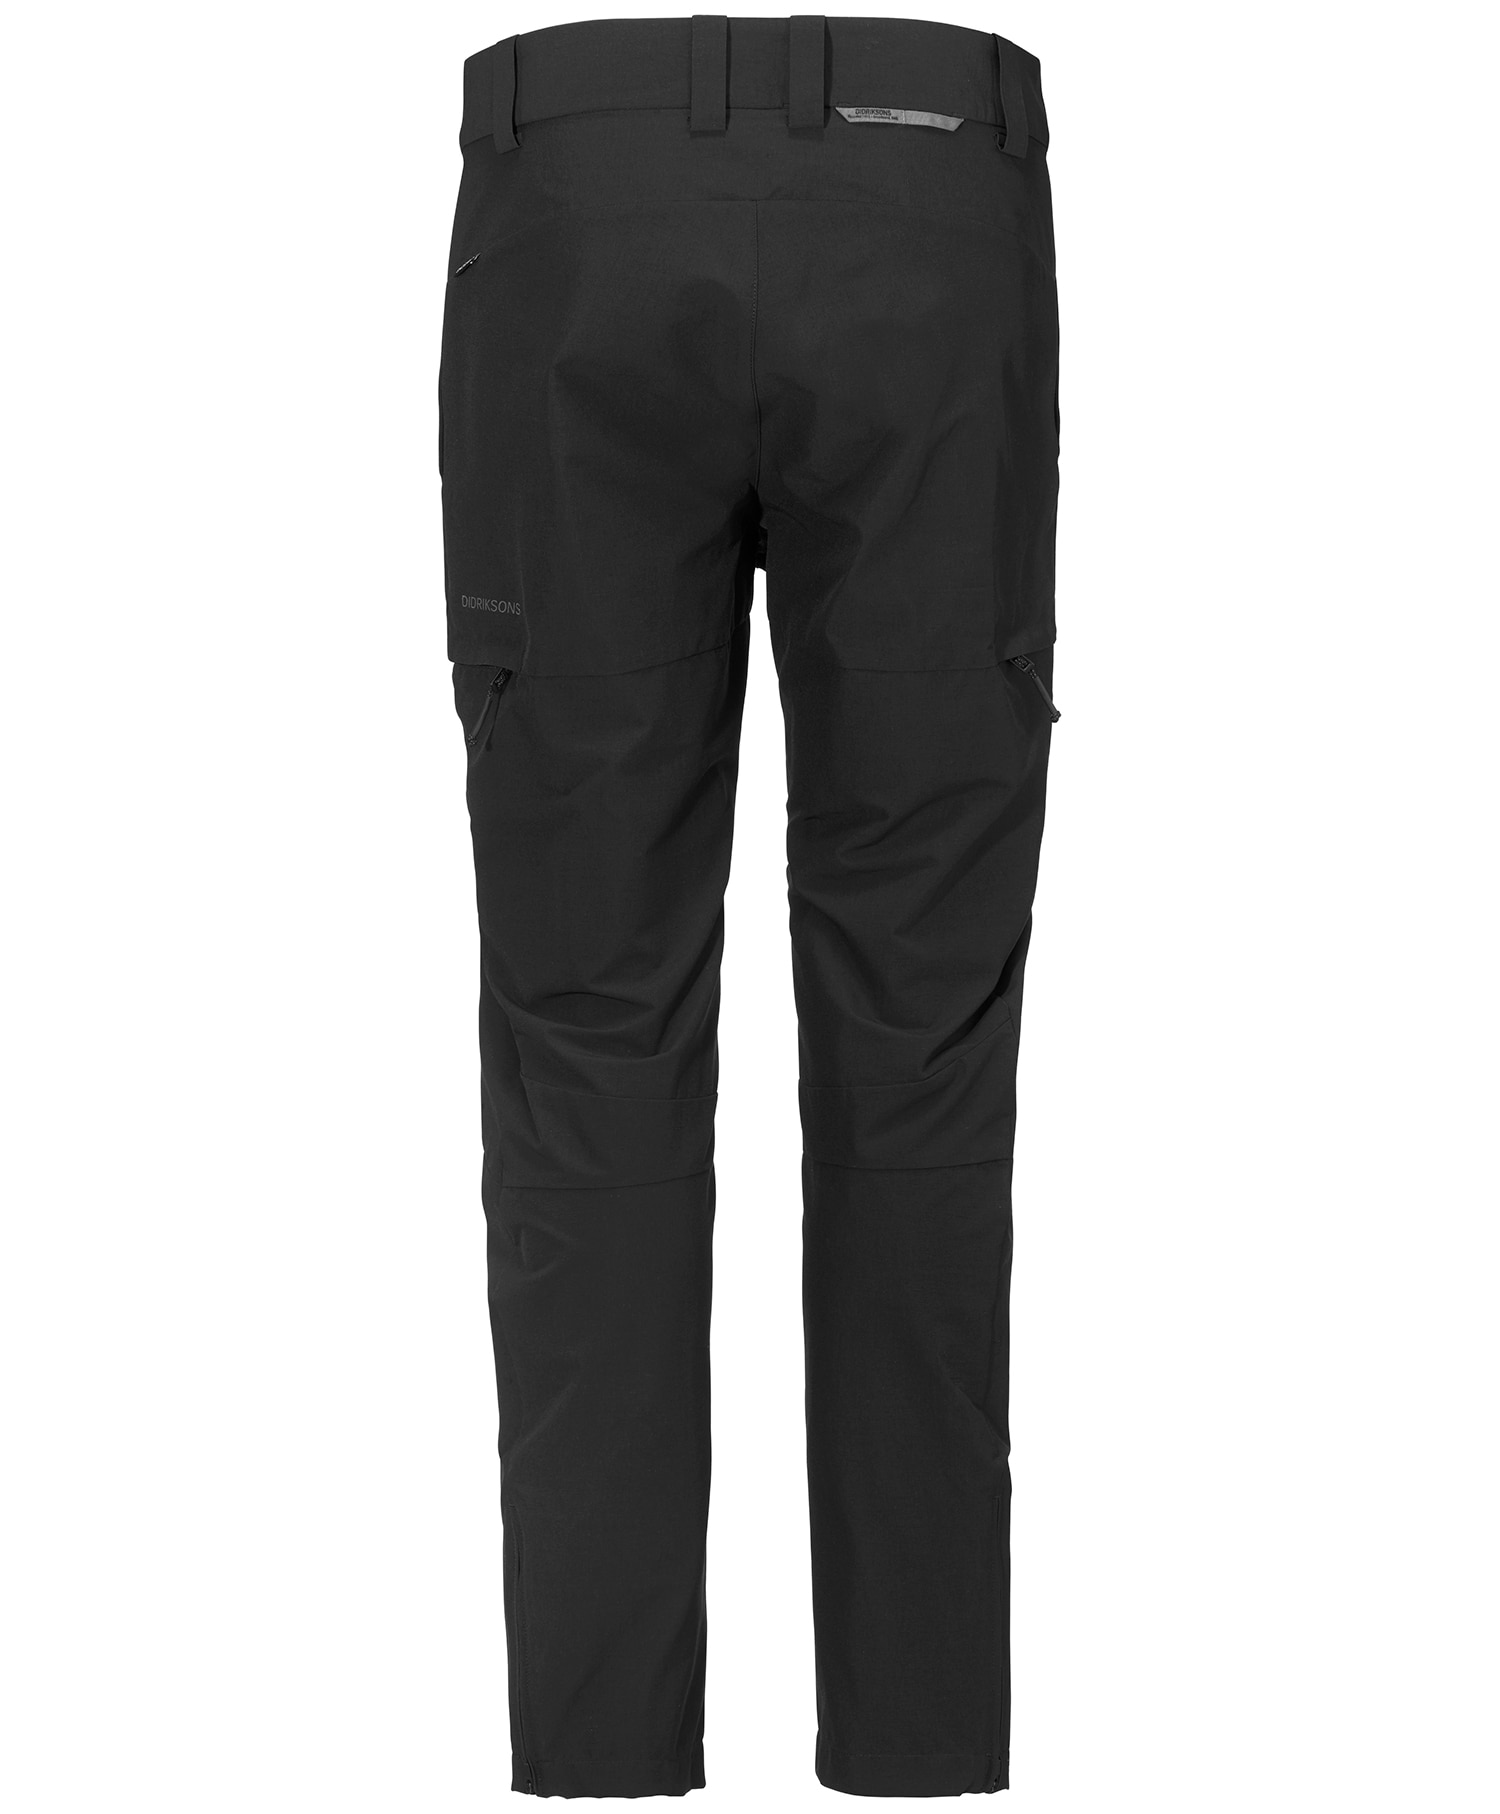 Didriksons Sverre bukser